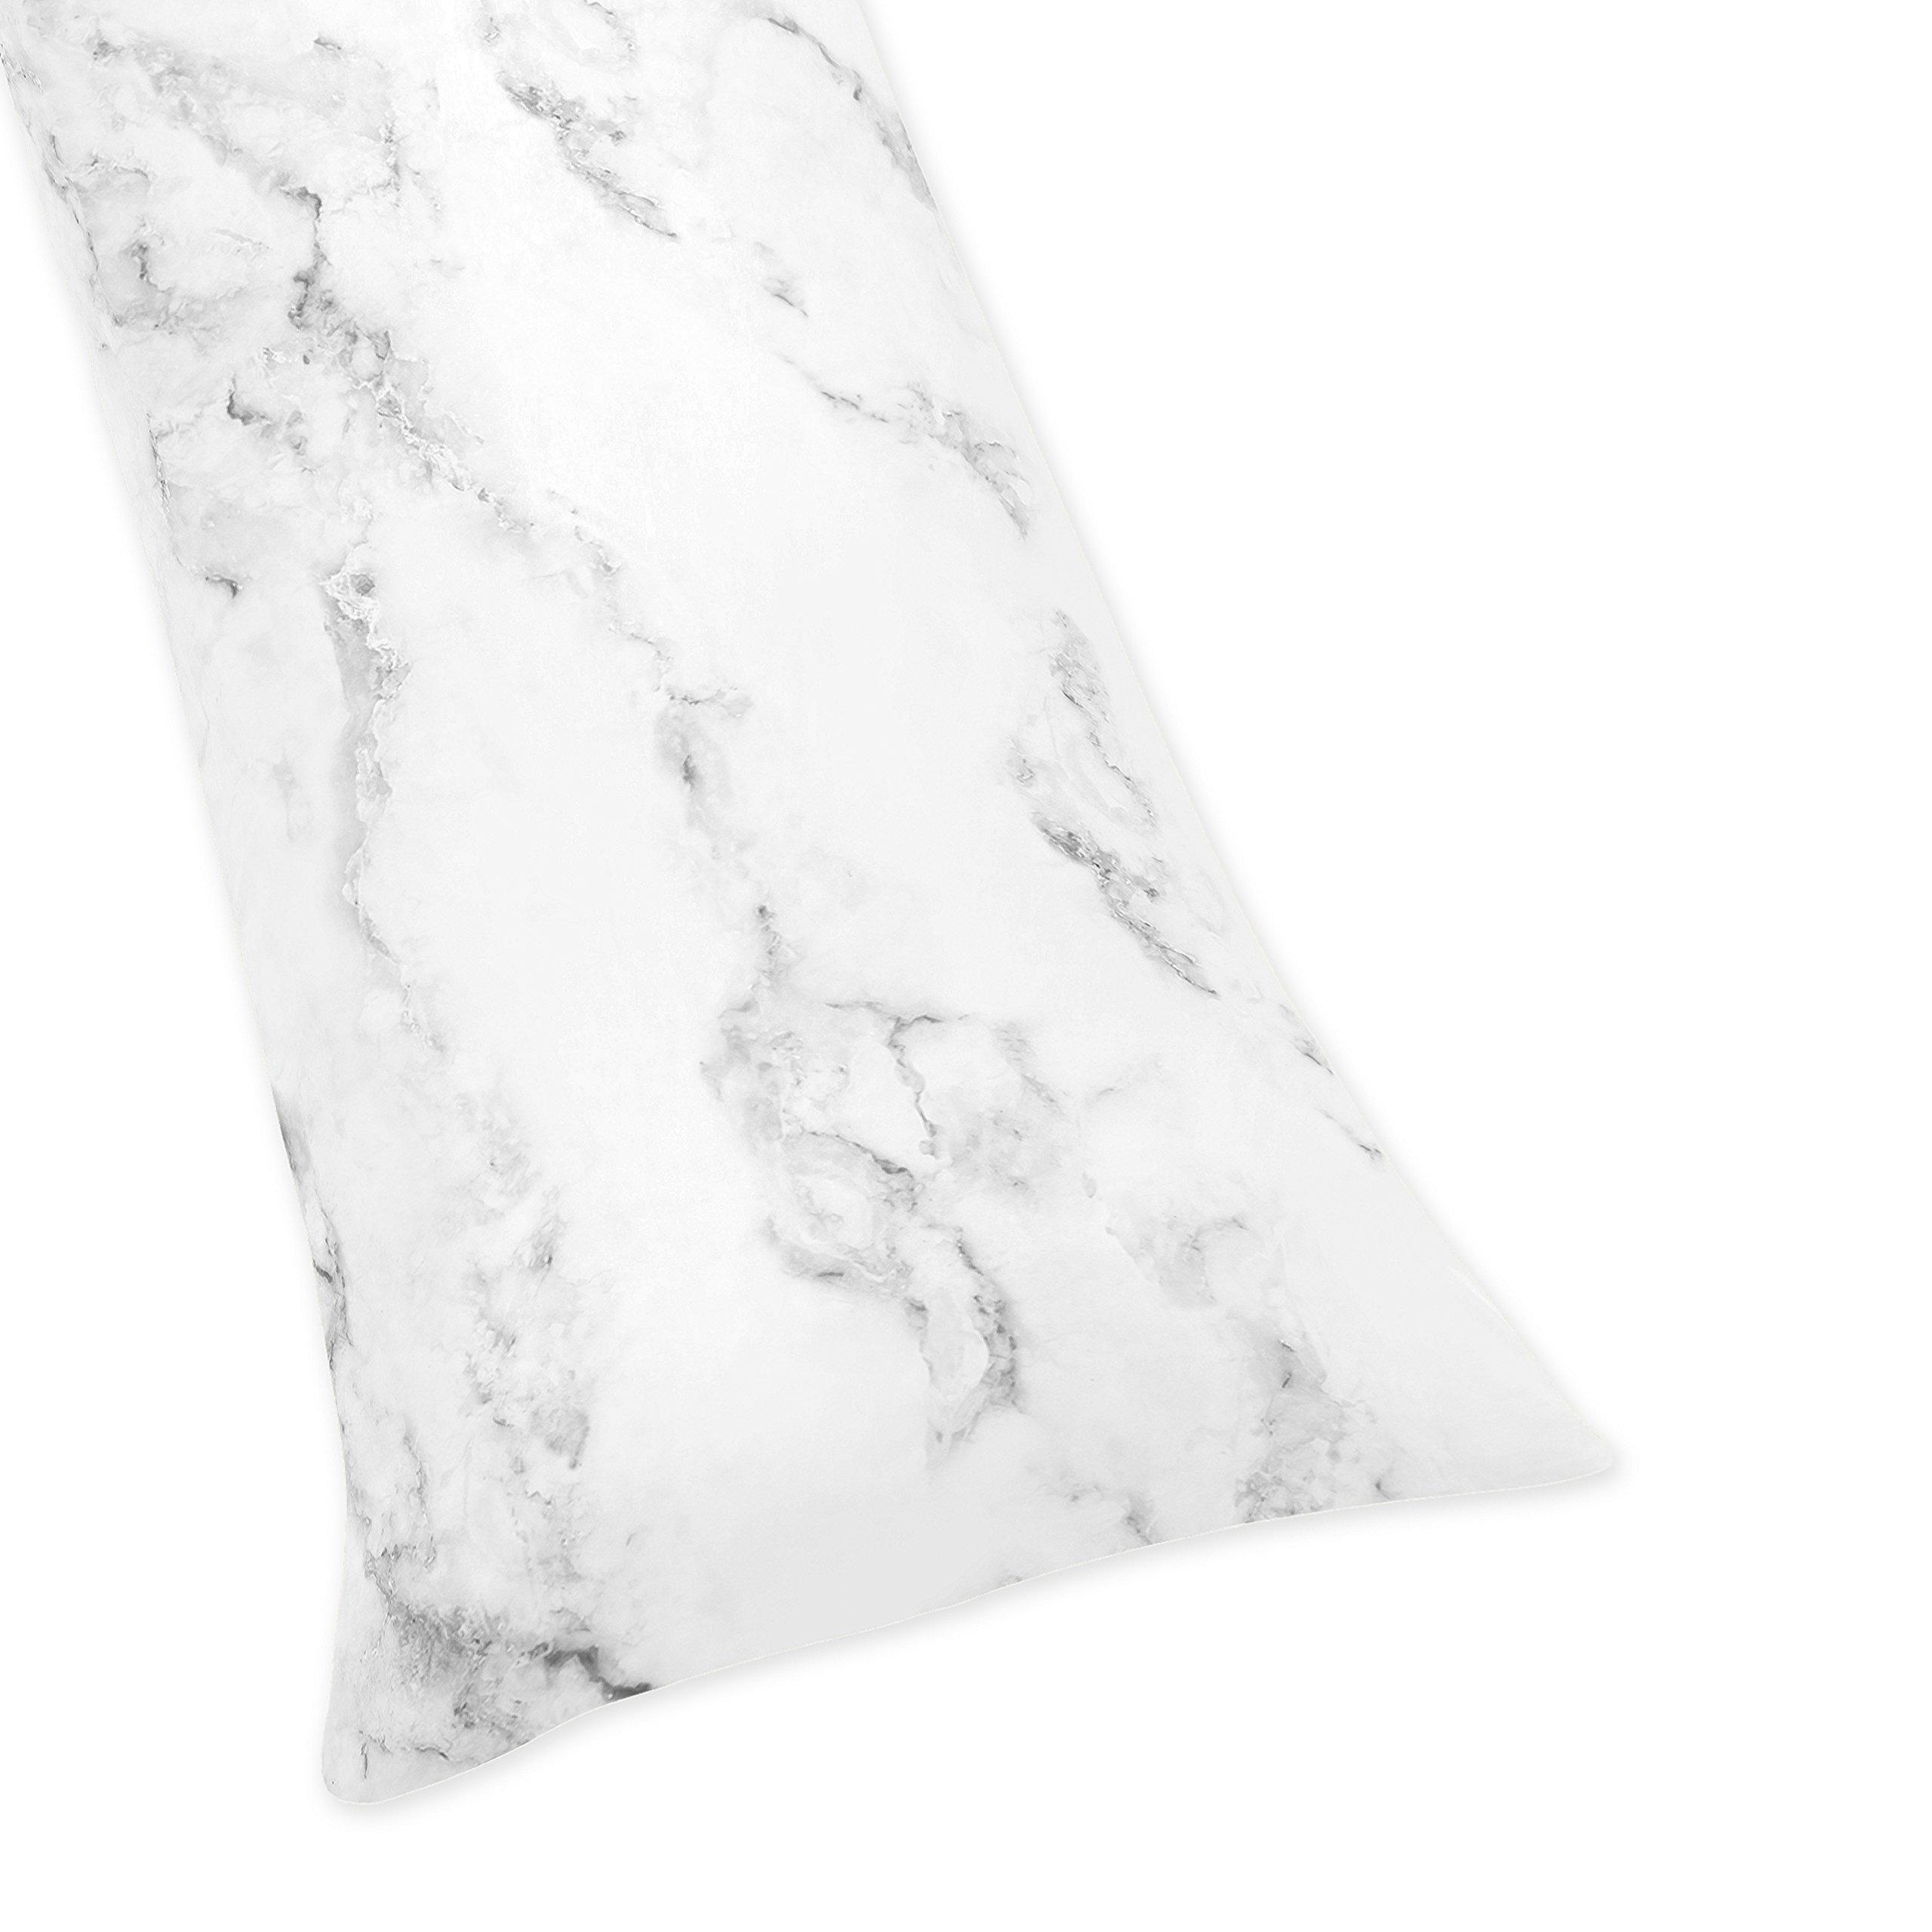 Sweet JoJo Designs Modern Grey, Black and White Marble Print Full Length Double Zippered Body Pillow Case Cover